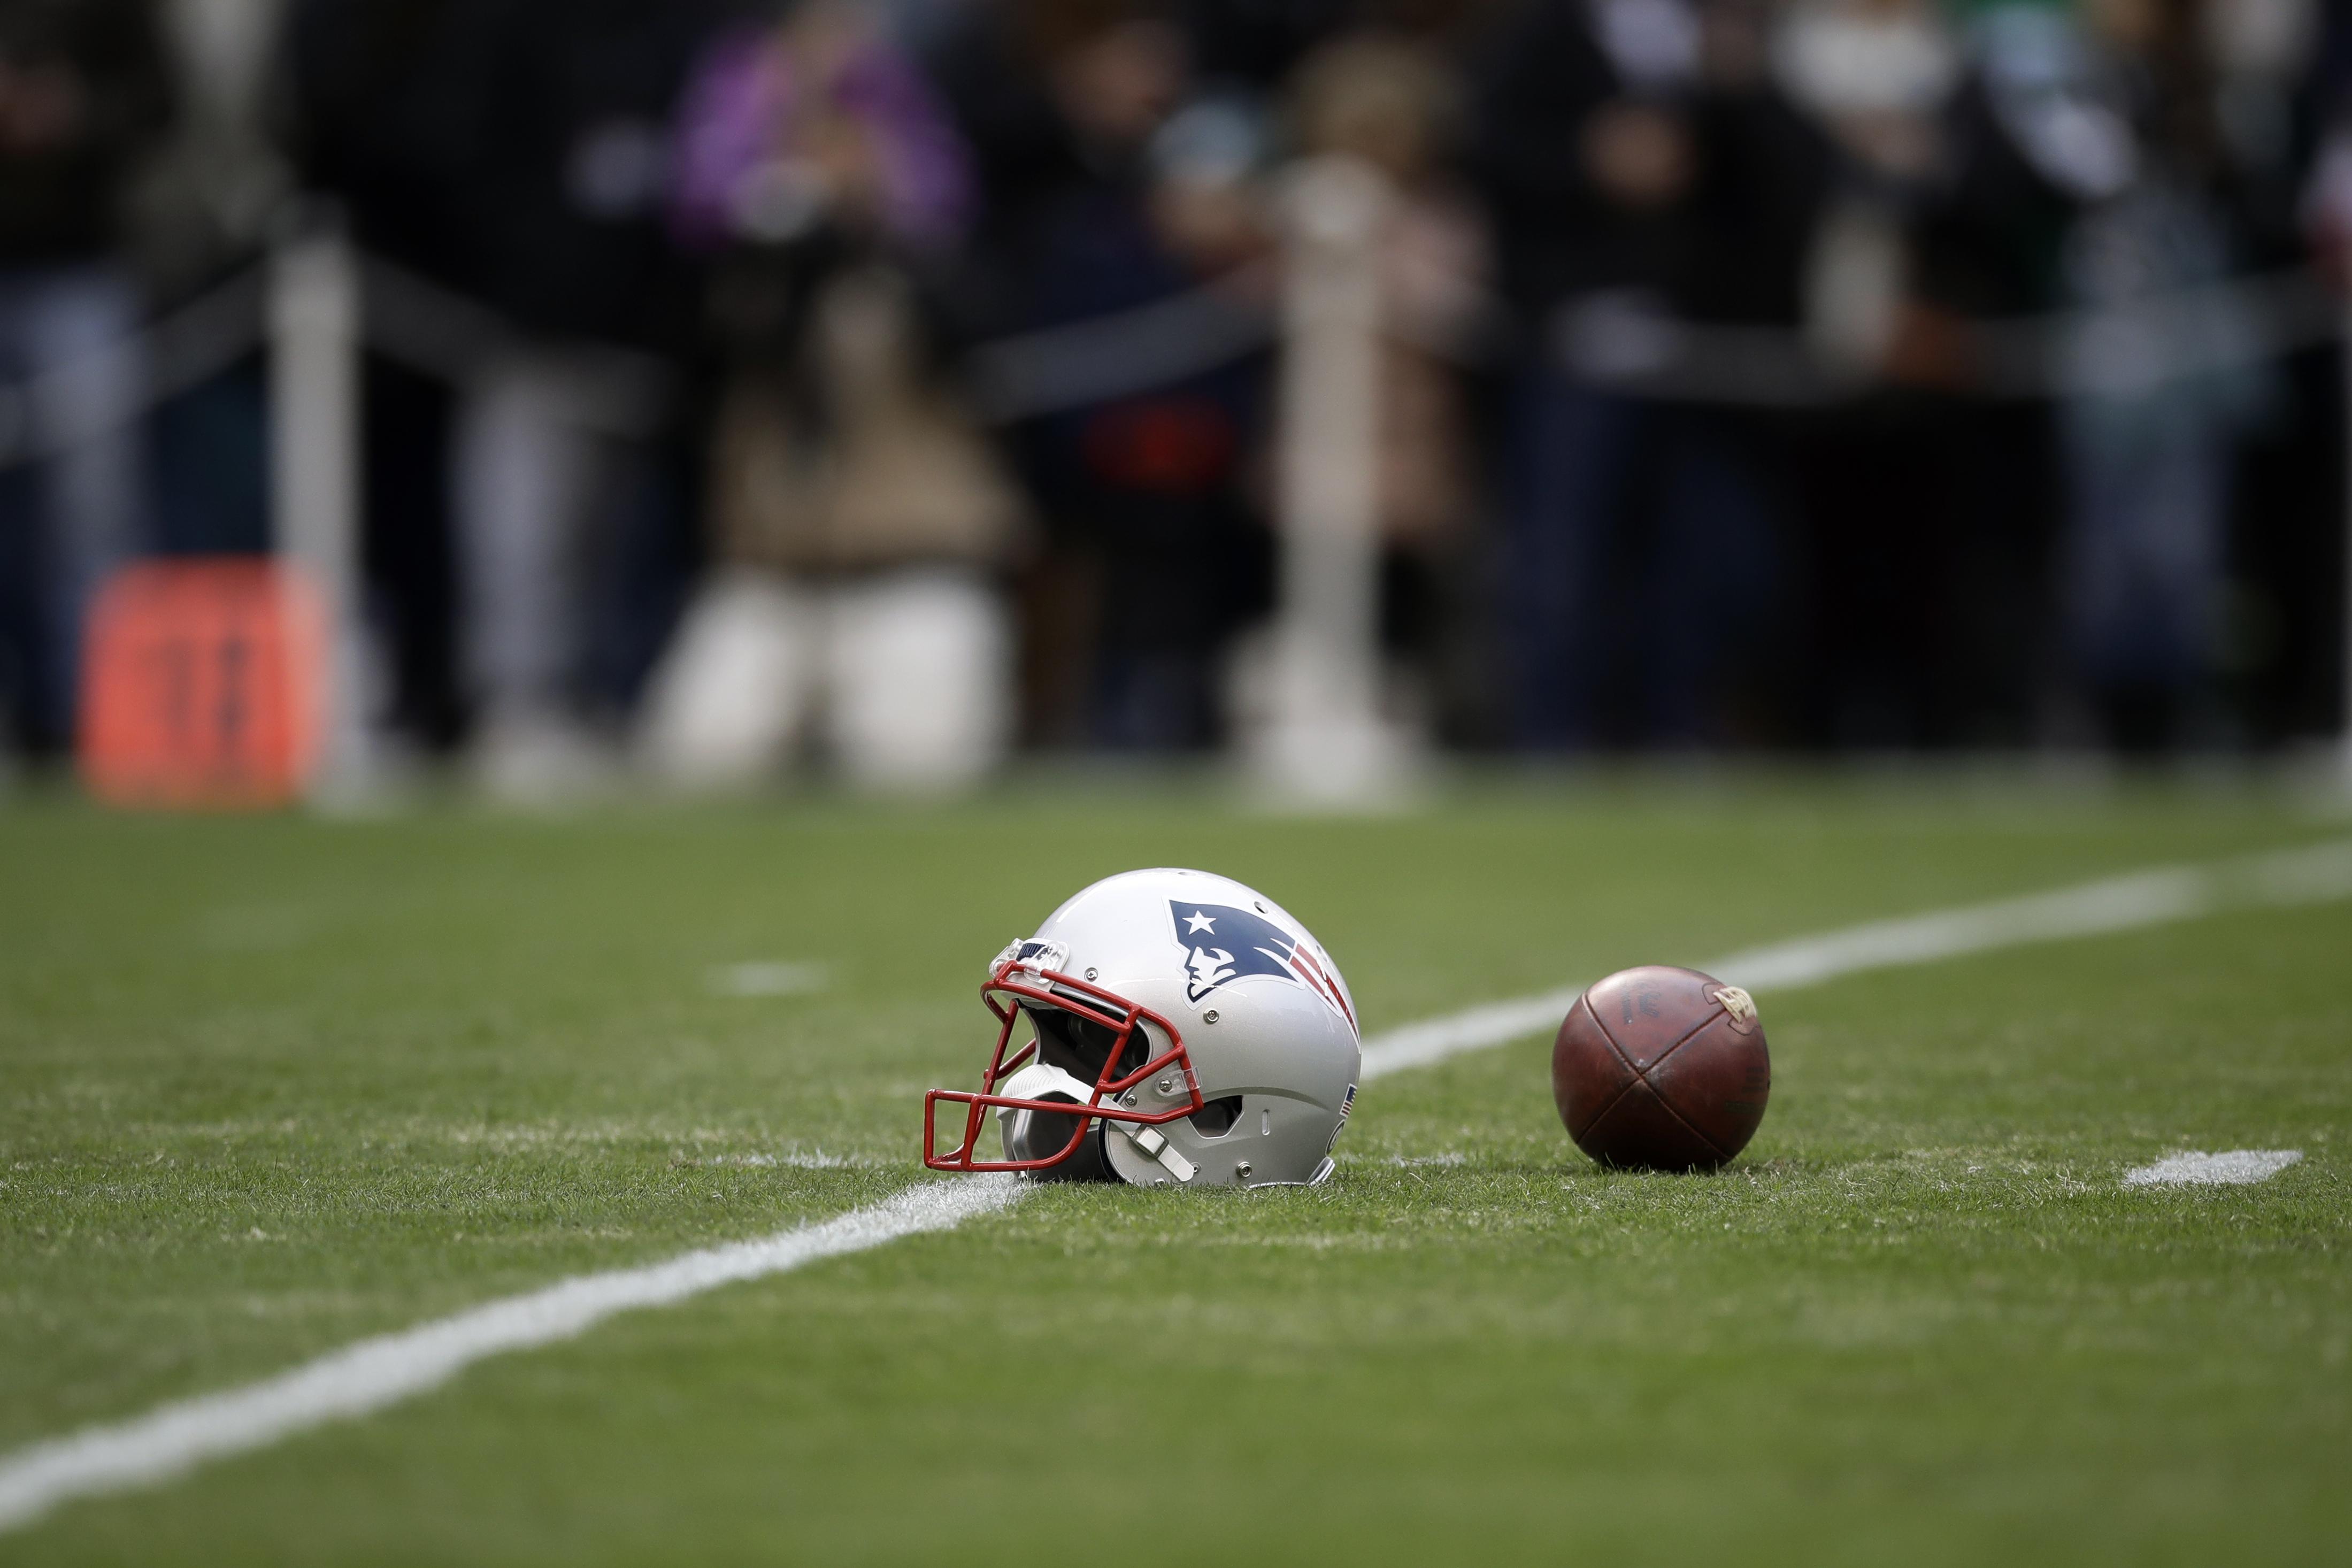 Nfl Postpones Broncos Patriots Game Indefinitely Due To Coronavirus